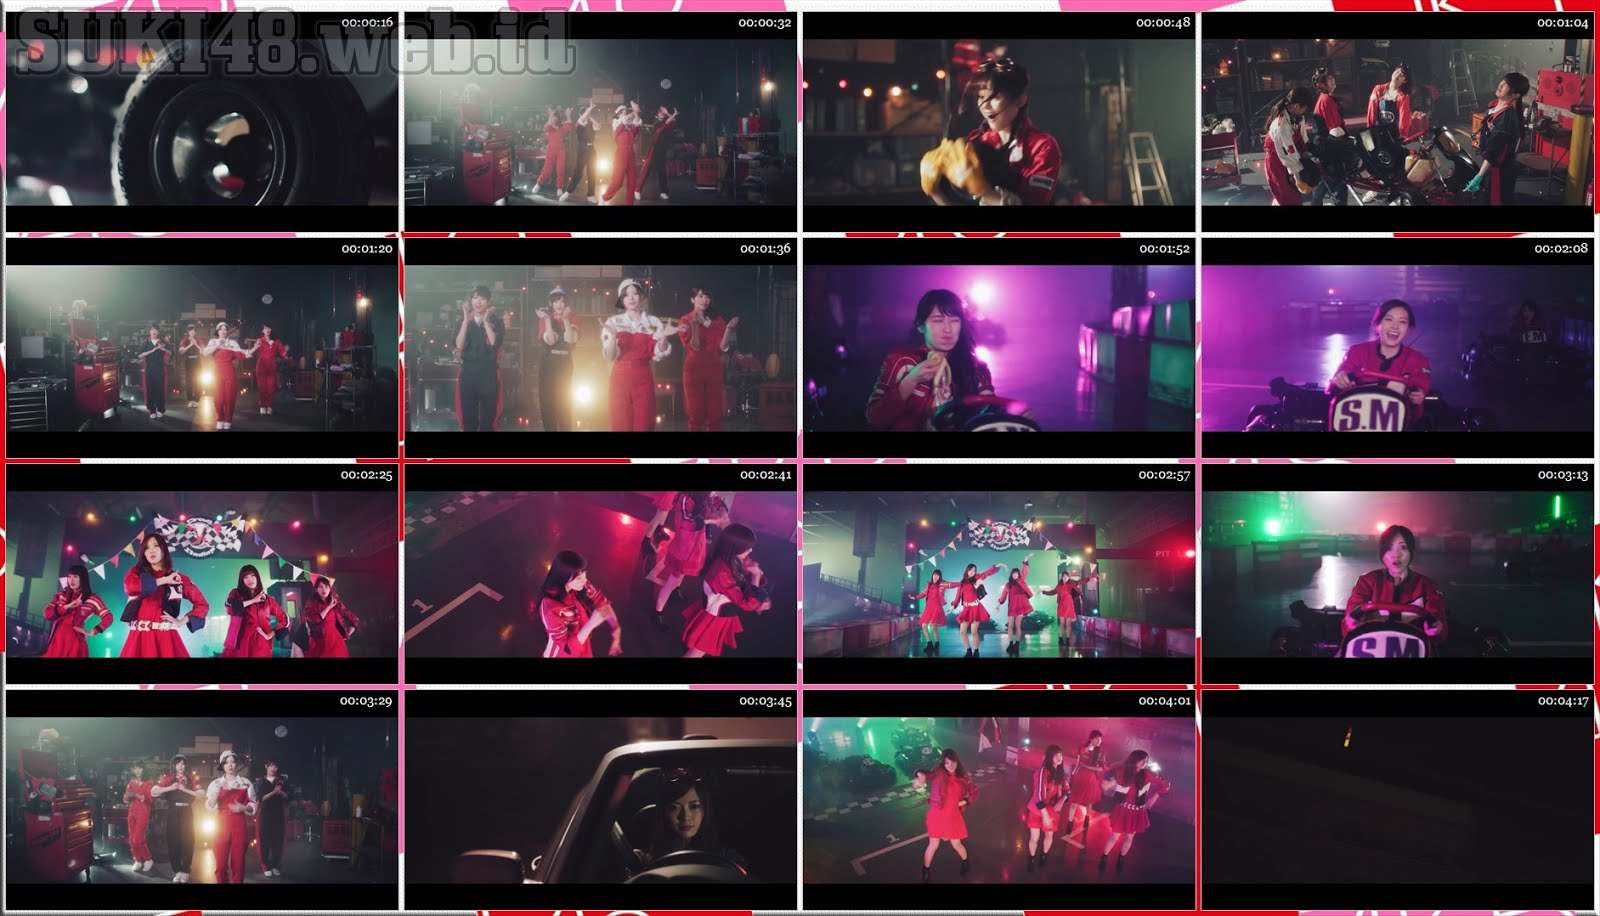 Nogizaka46 17th single